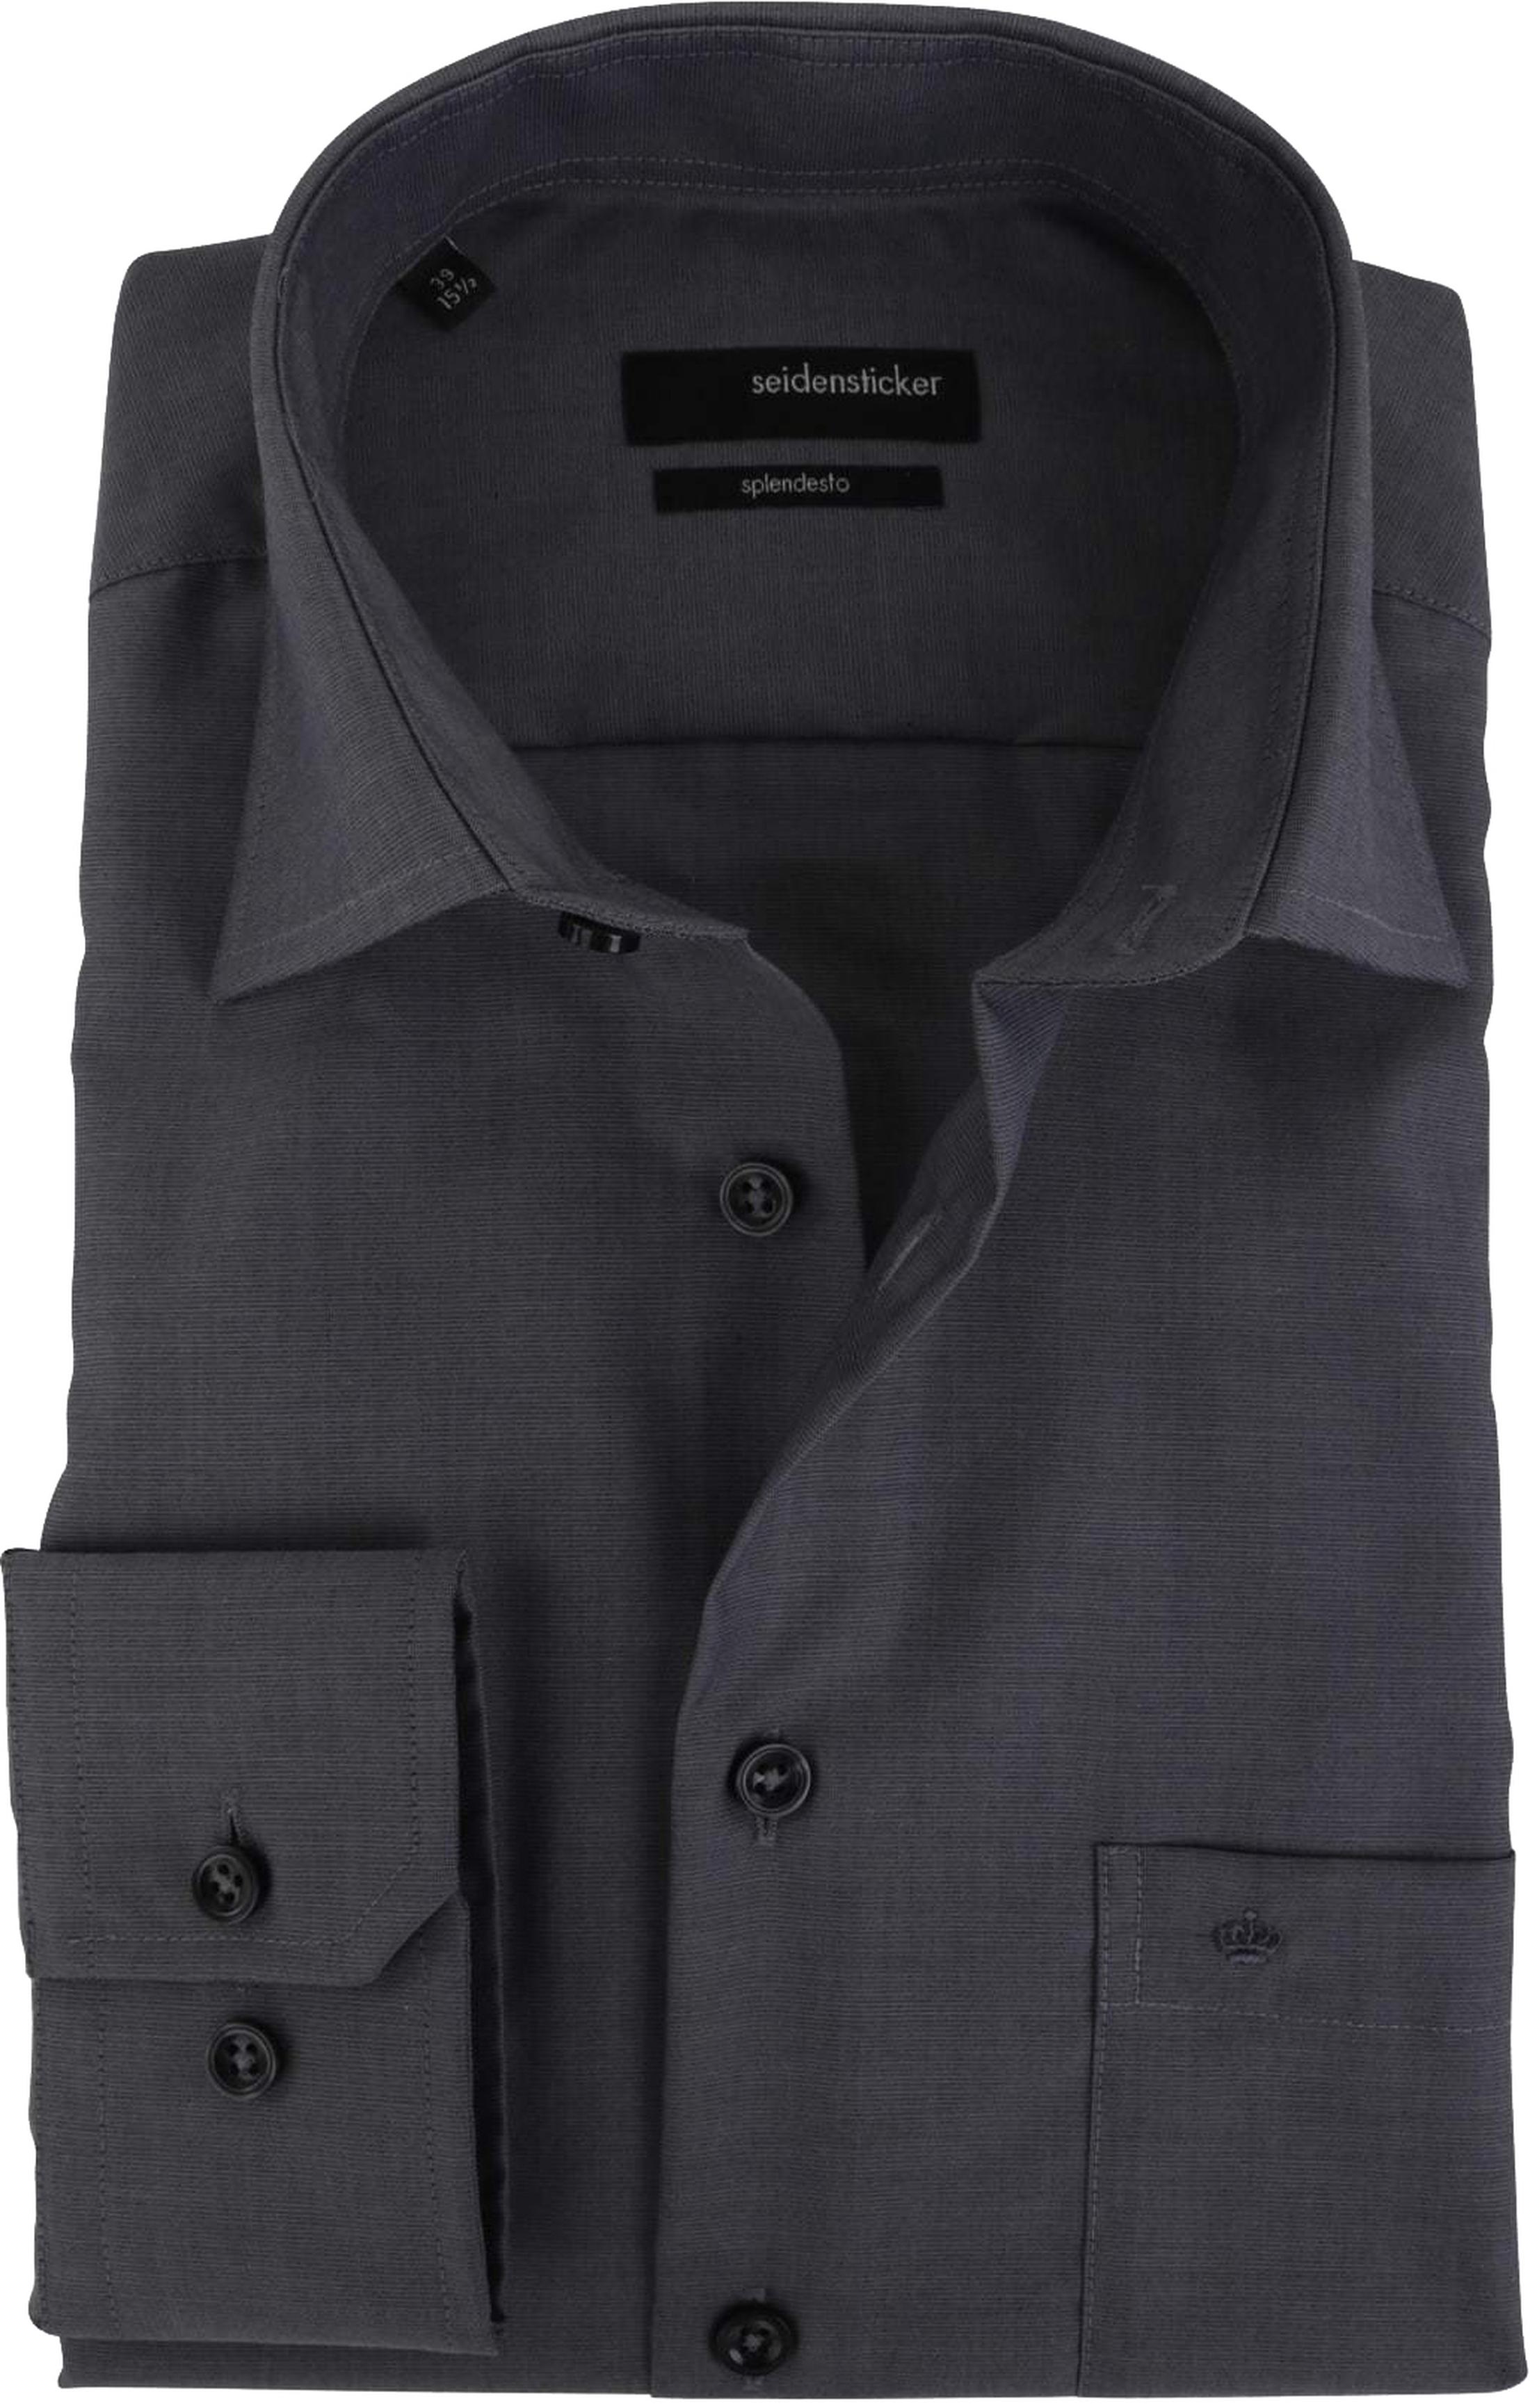 Seidensticker Overhemd Comfort Fit Antraciet foto 0